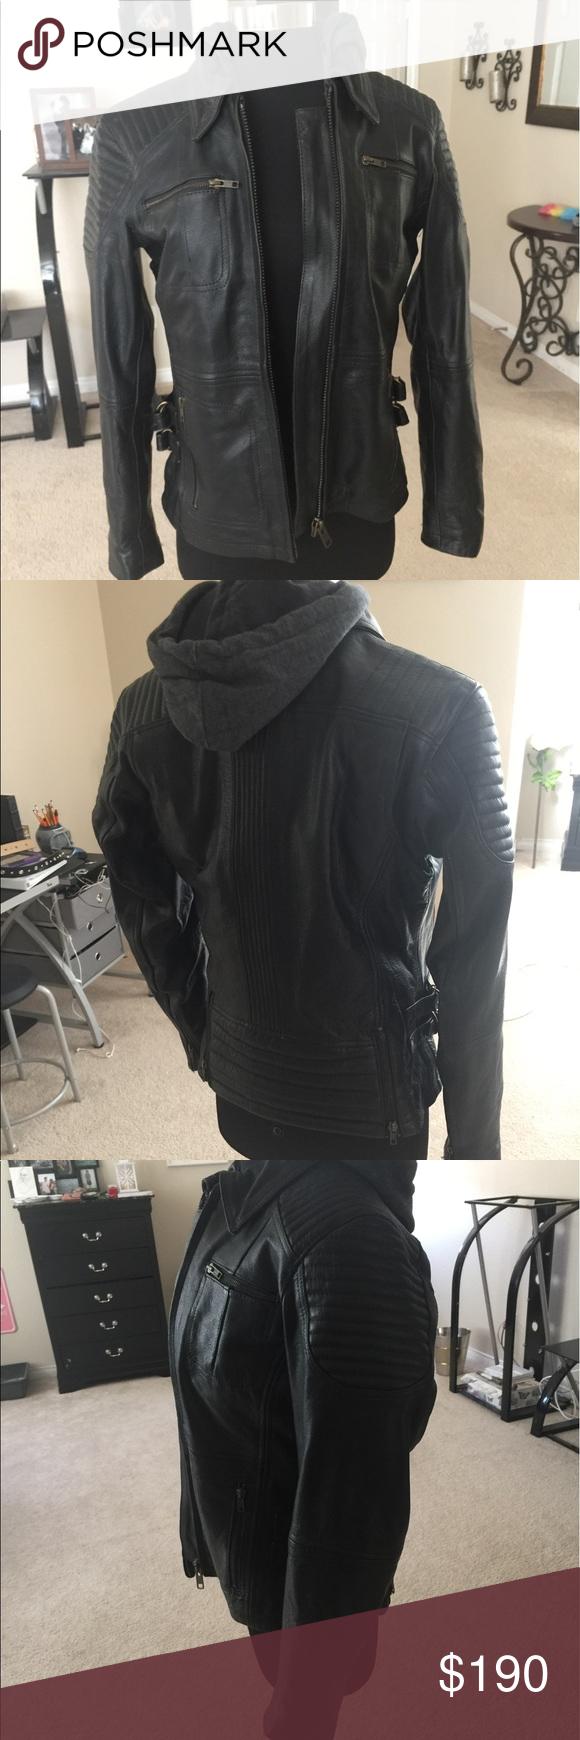 Black hooded motorcycle jacket Size small. Has gray hooded sweatshirt inside unknown Jackets & Coats